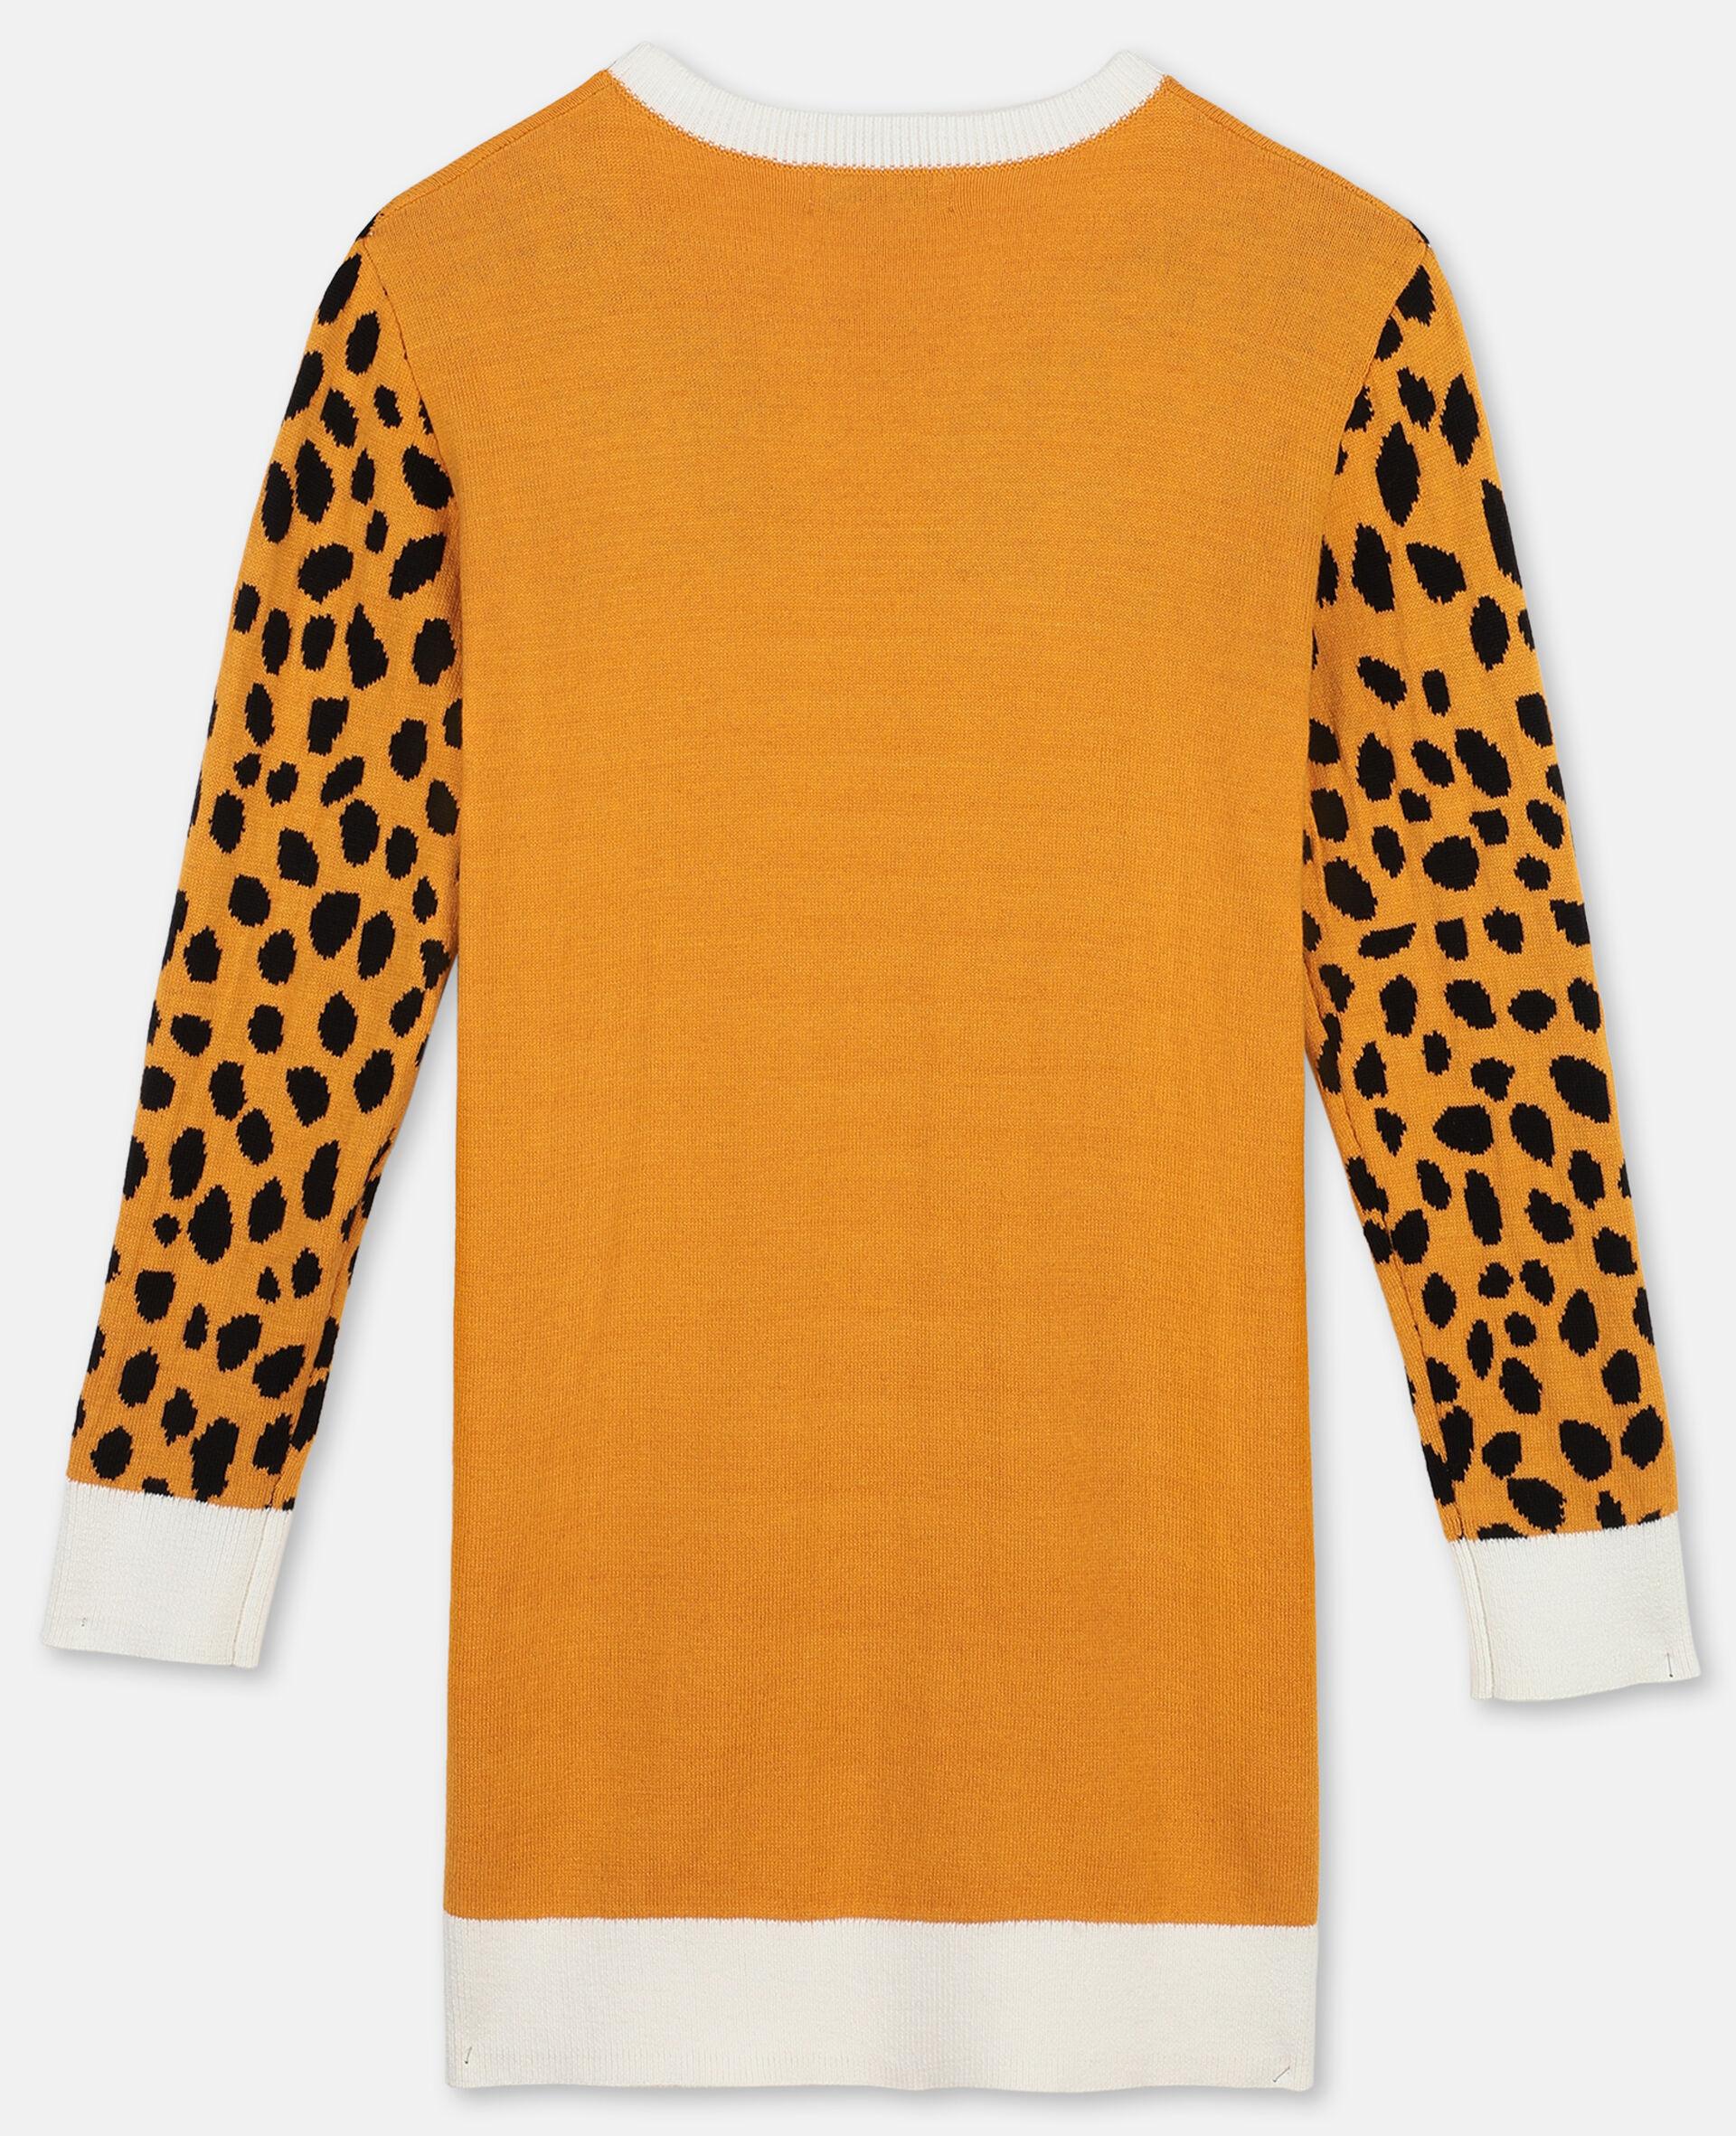 Cheetah嵌花针织连衣裙-橙色-large image number 3